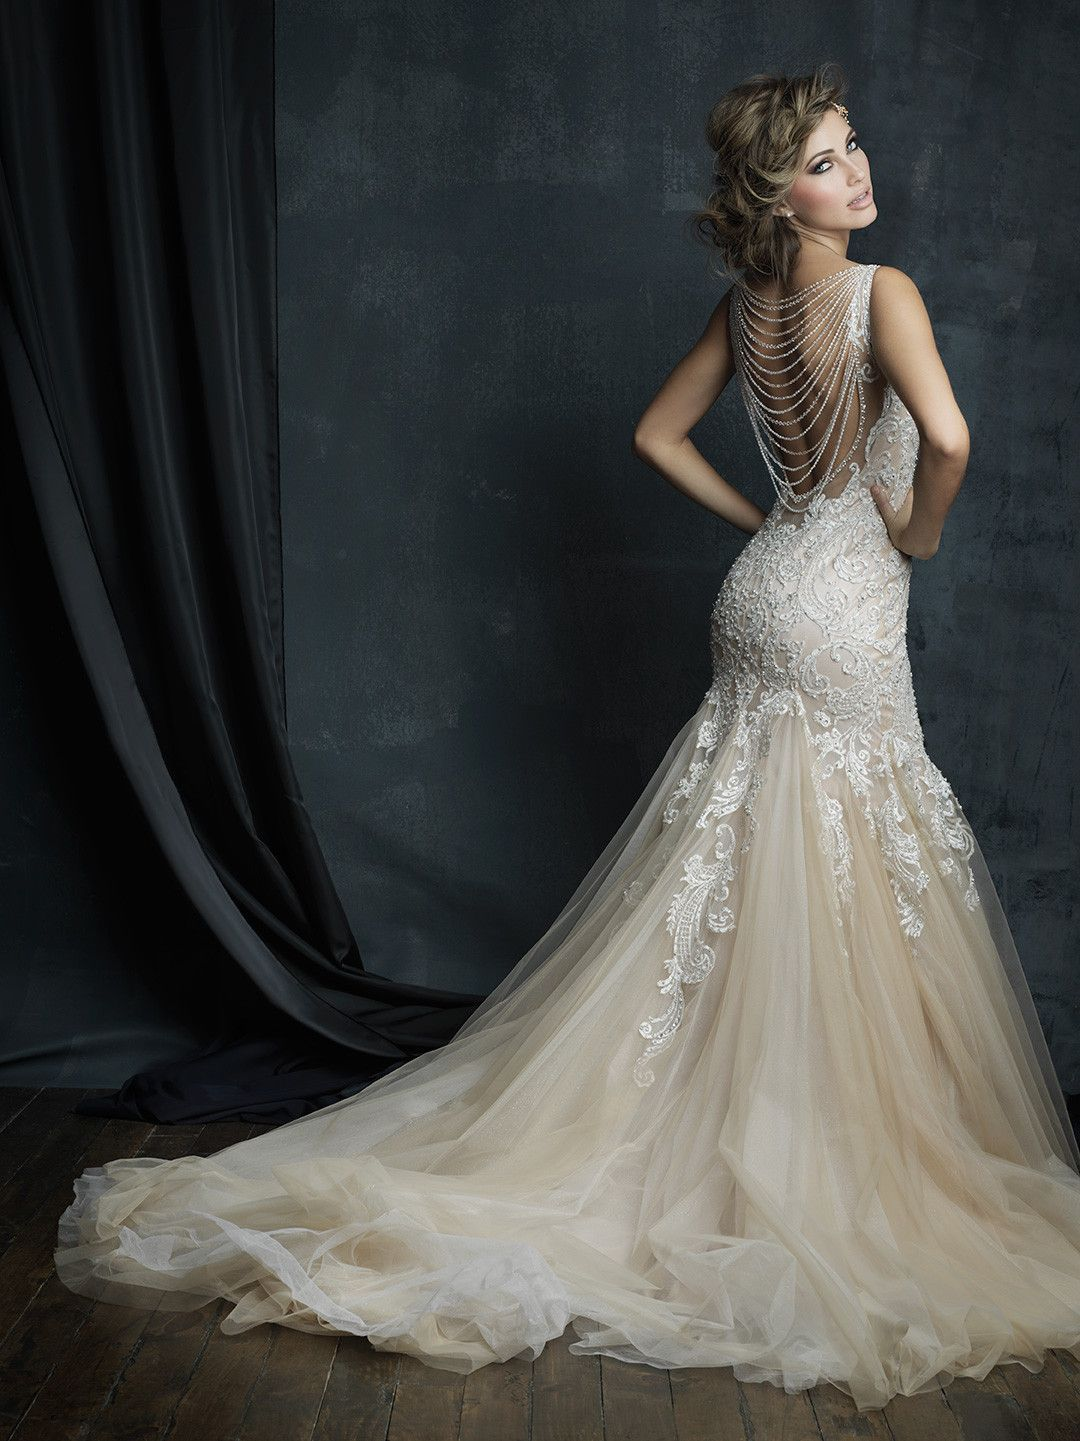 Wedding dresses fresno  Allure Couture C  Wedding Dresses  Pinterest  Allure couture